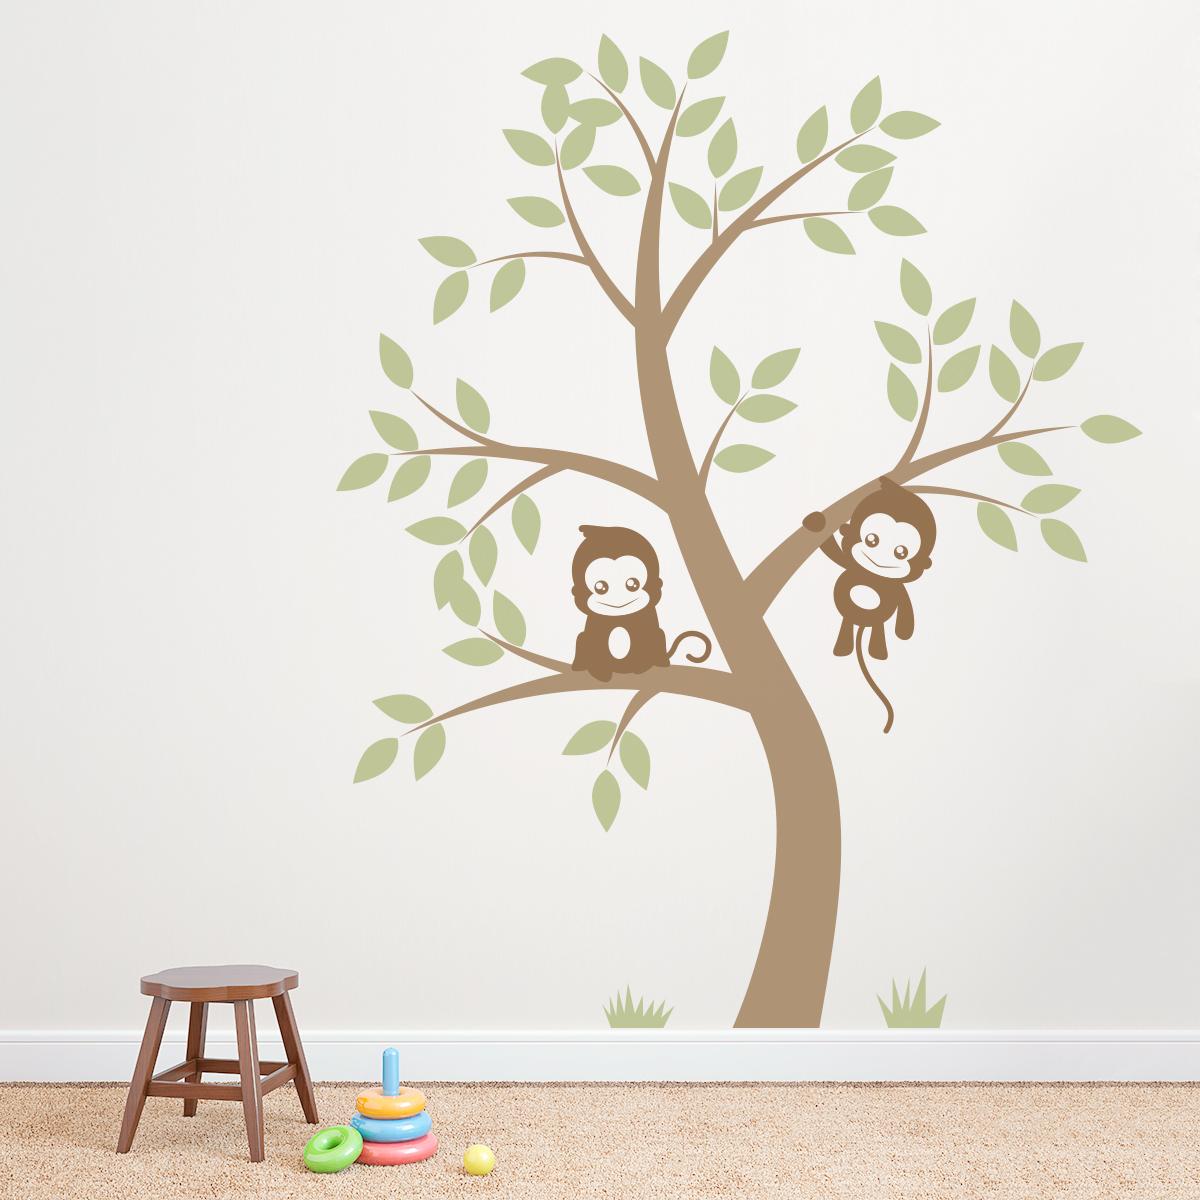 wall decals tree 2017 - Grasscloth Wallpaper